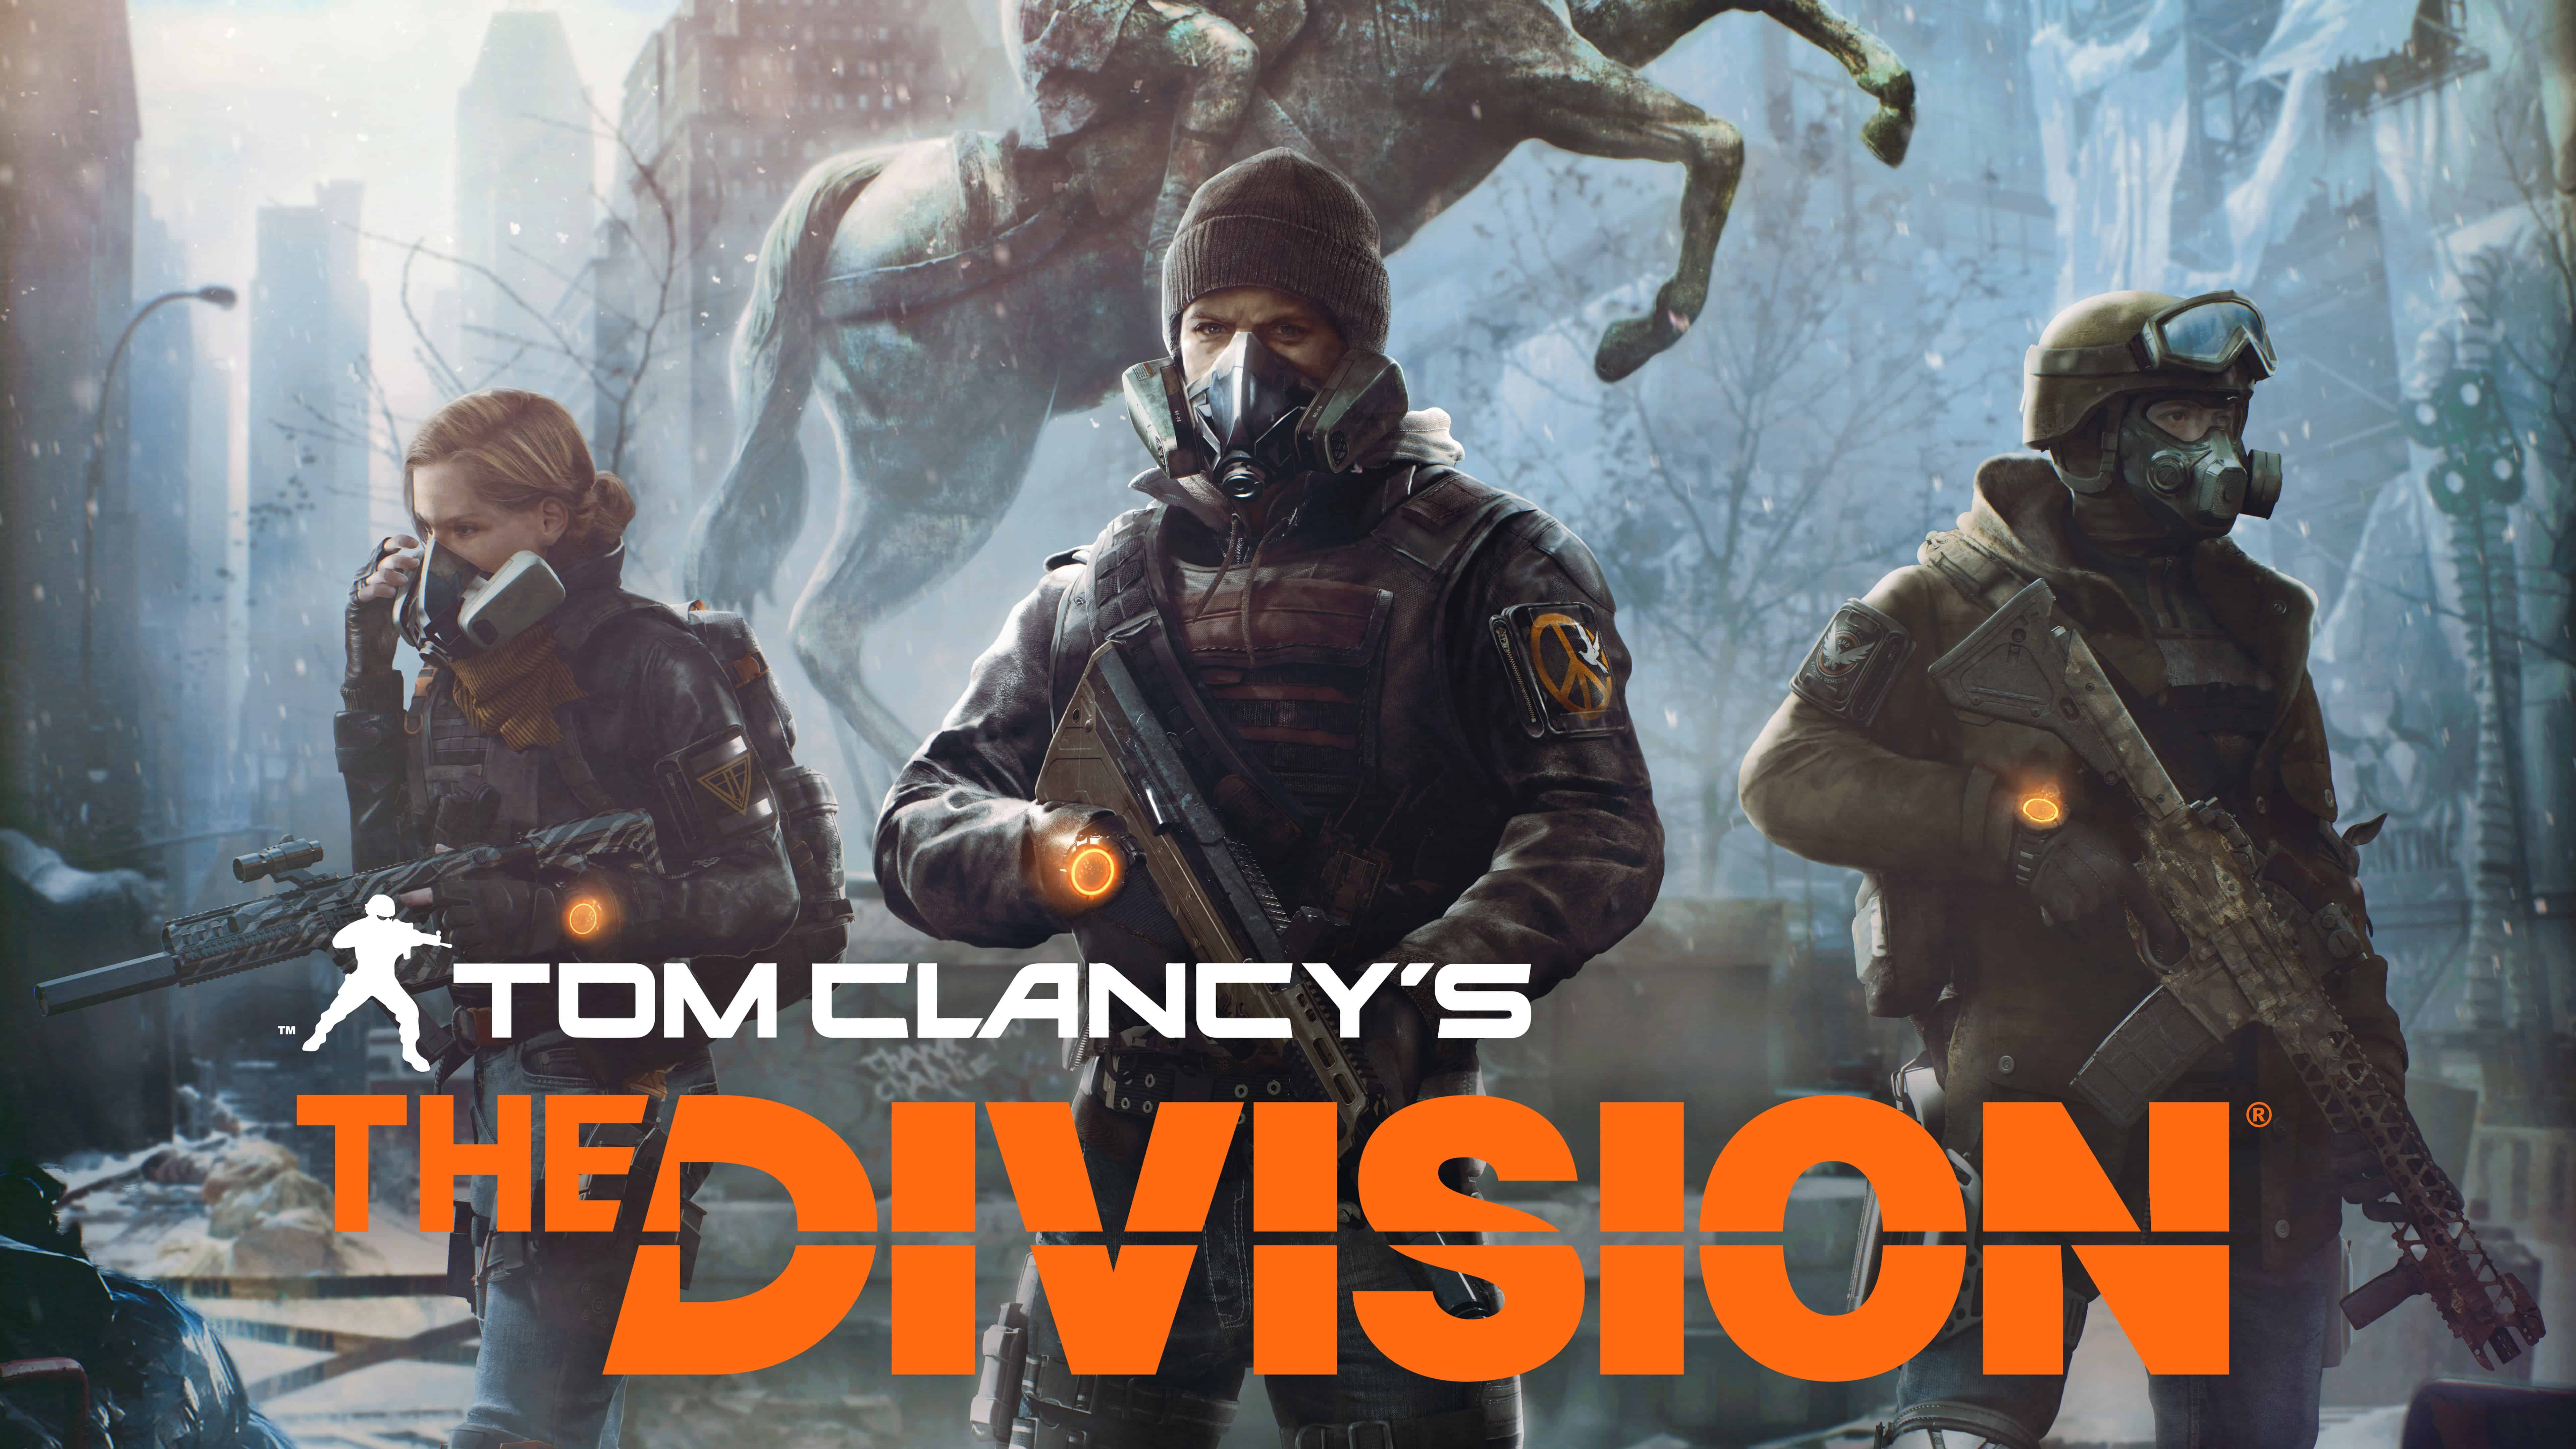 Tom Clancys The Division Uhd 8k Wallpaper Pixelz